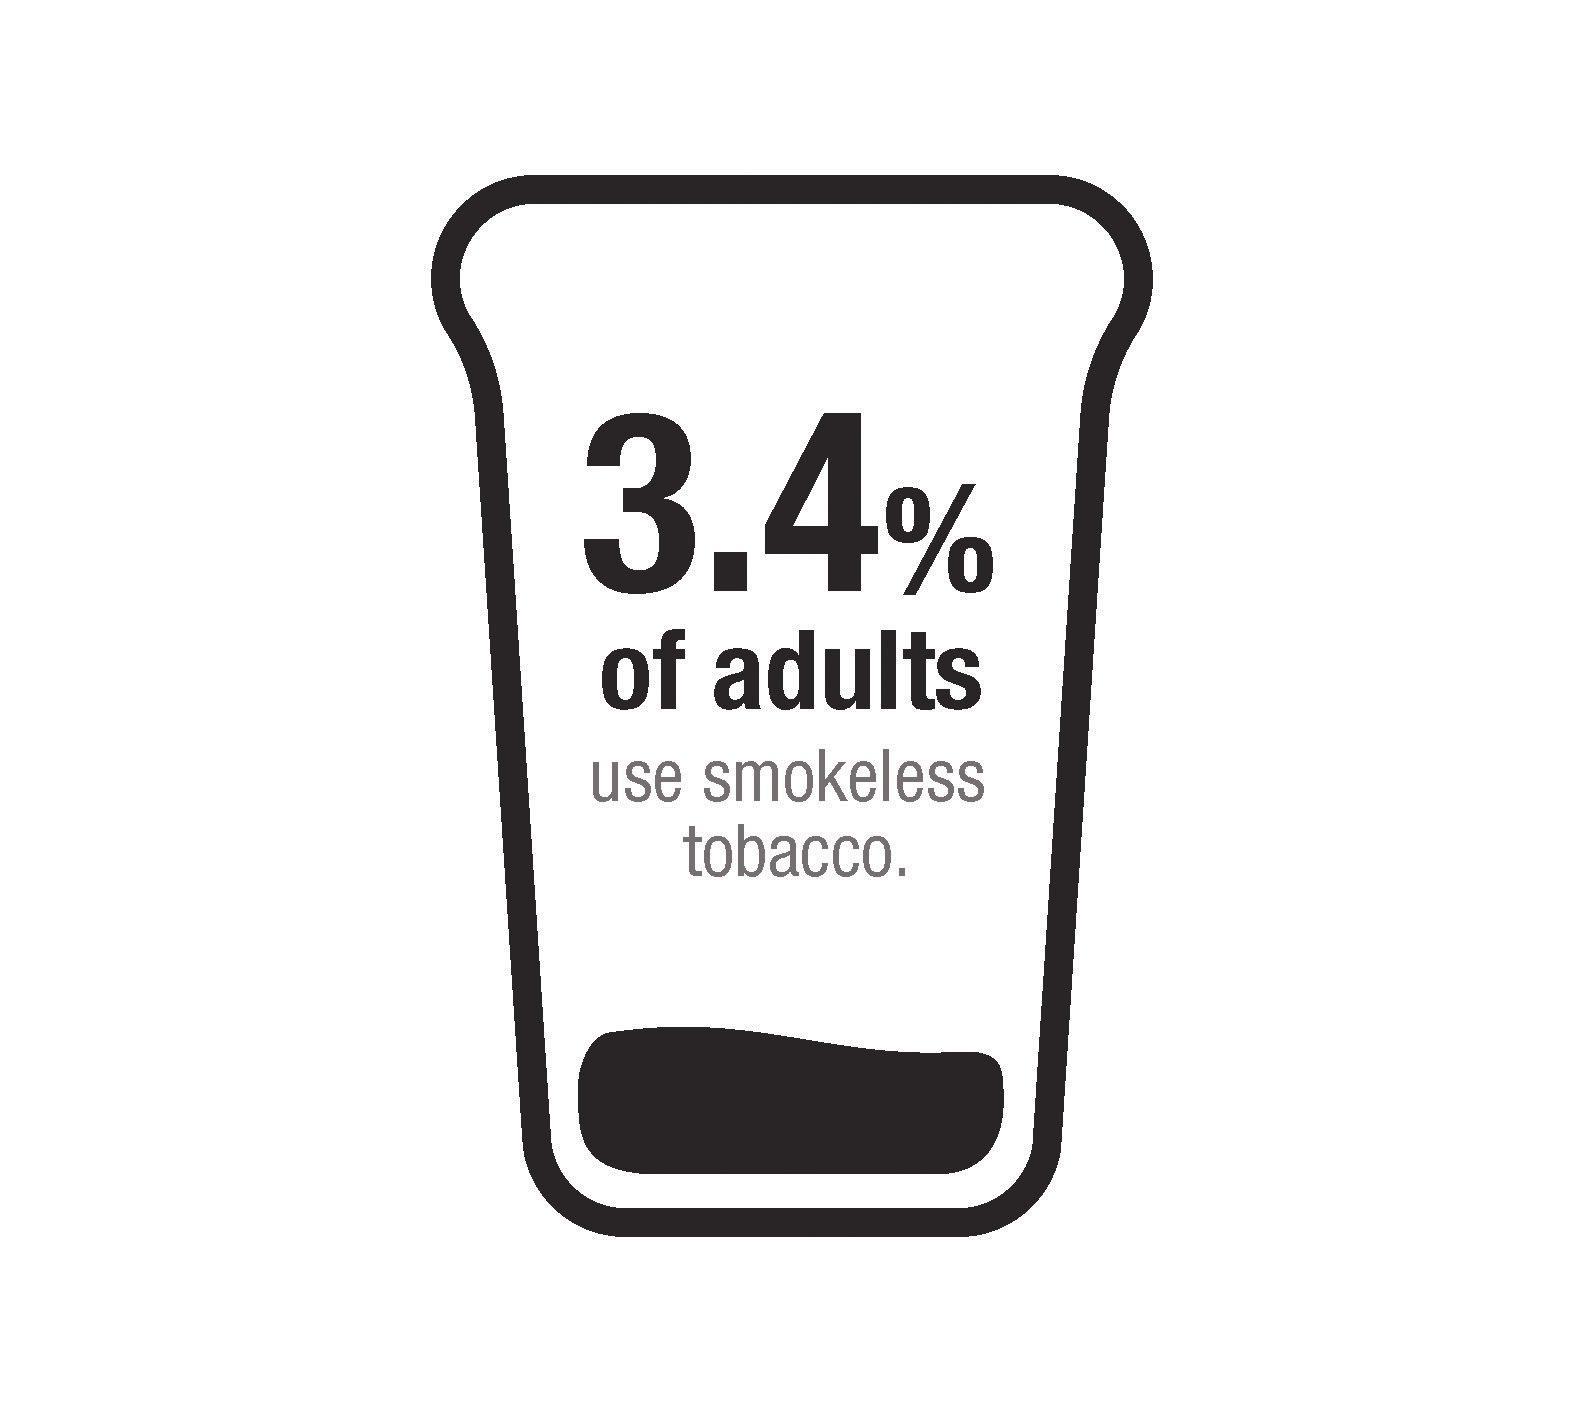 Smokeless Tobacco Health Effects